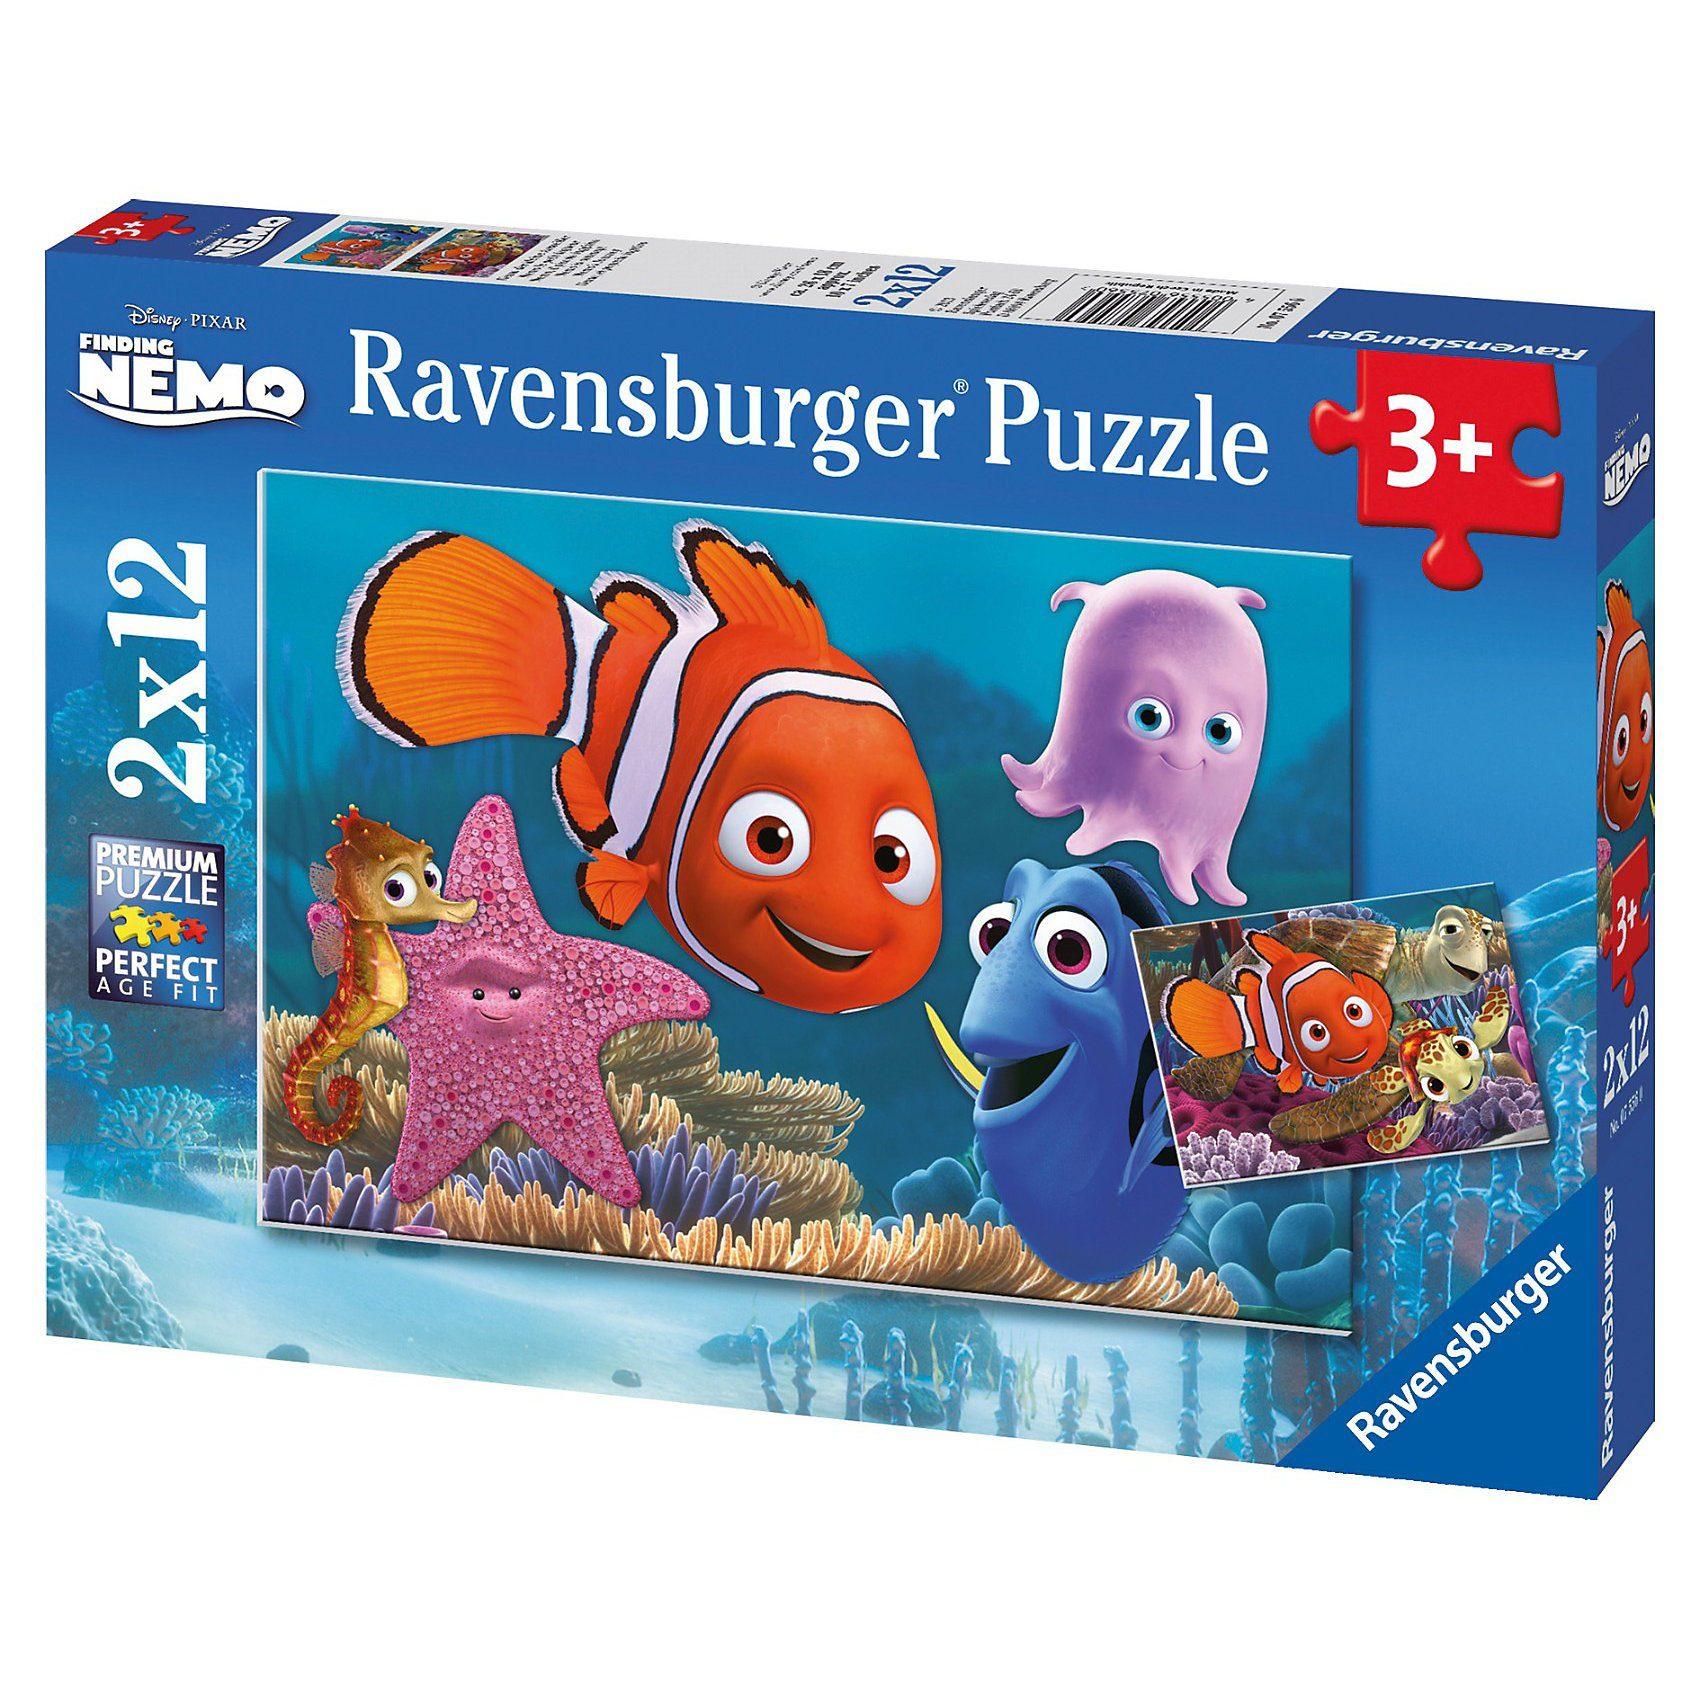 Ravensburger 2er Set Puzzle, je 12 Teile, 26x18 cm, Disney Finding Nemo